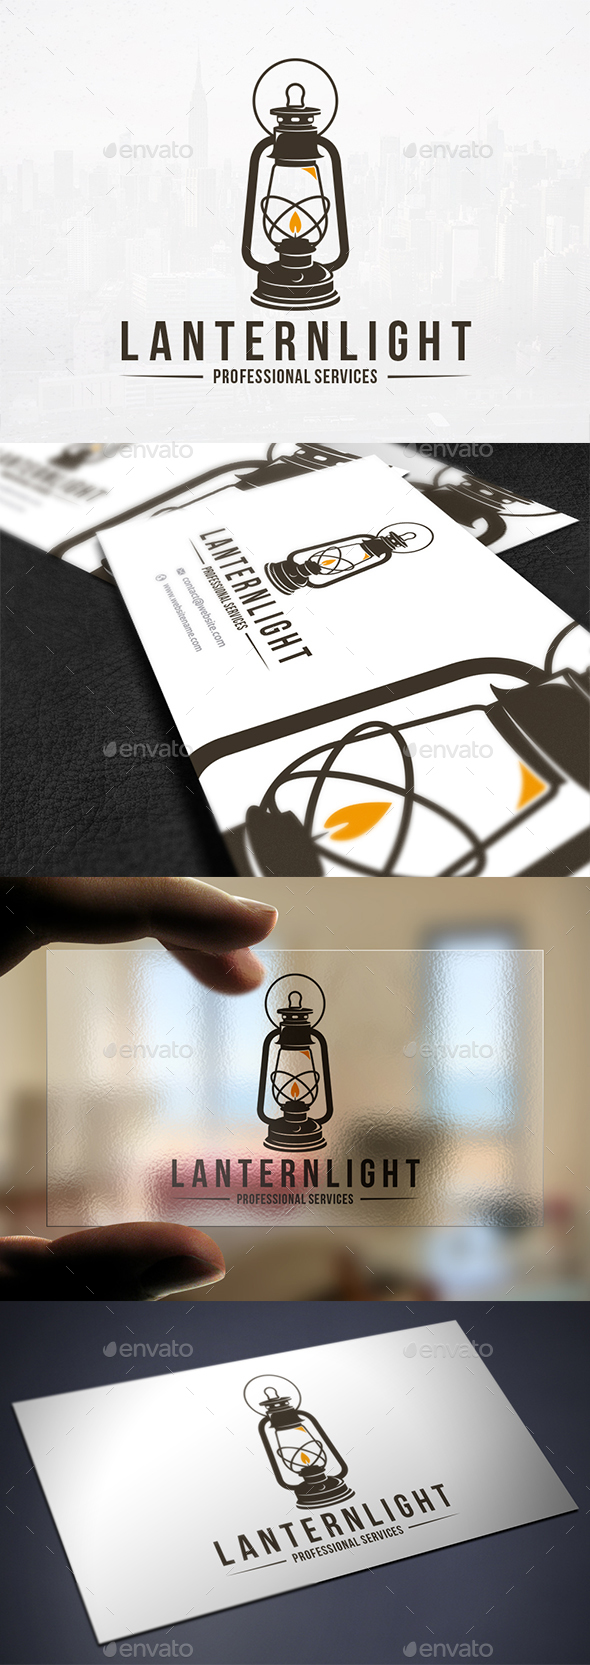 Lantern Light Logo Template - Objects Logo Templates